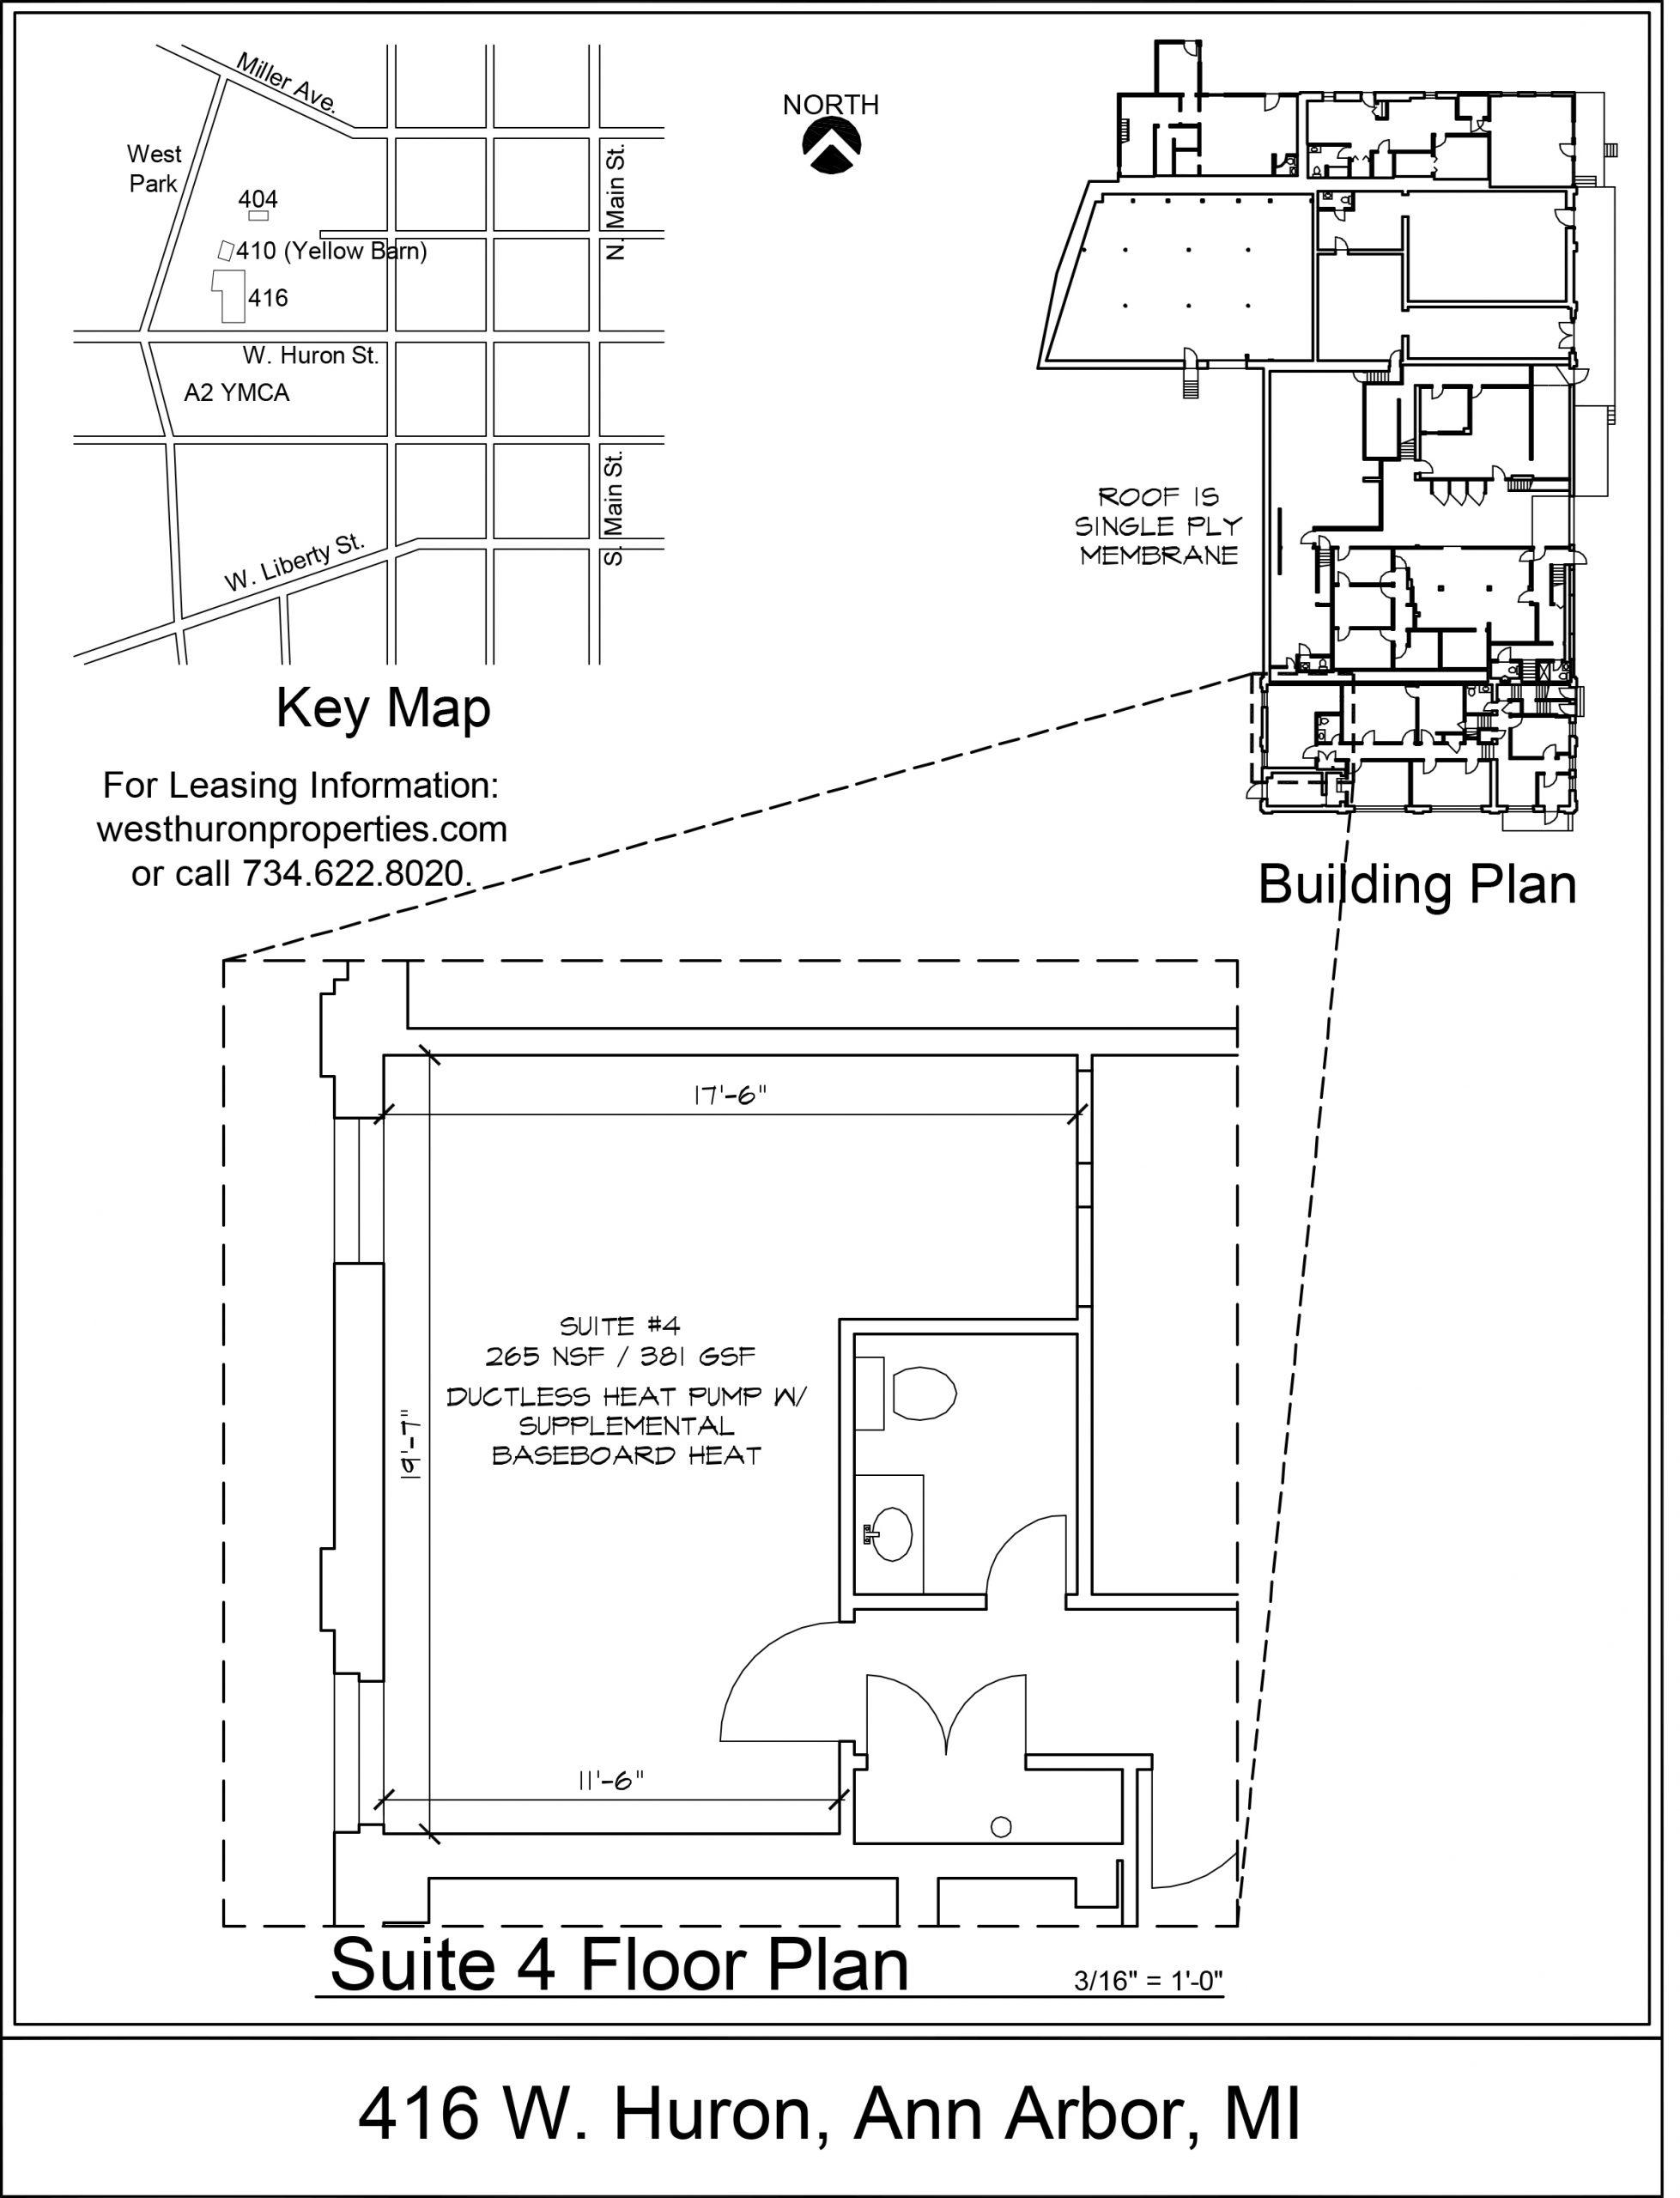 Y:Jobs 2016Van Fossen - 416 W Huron Yellow Barn416 AB & Lease